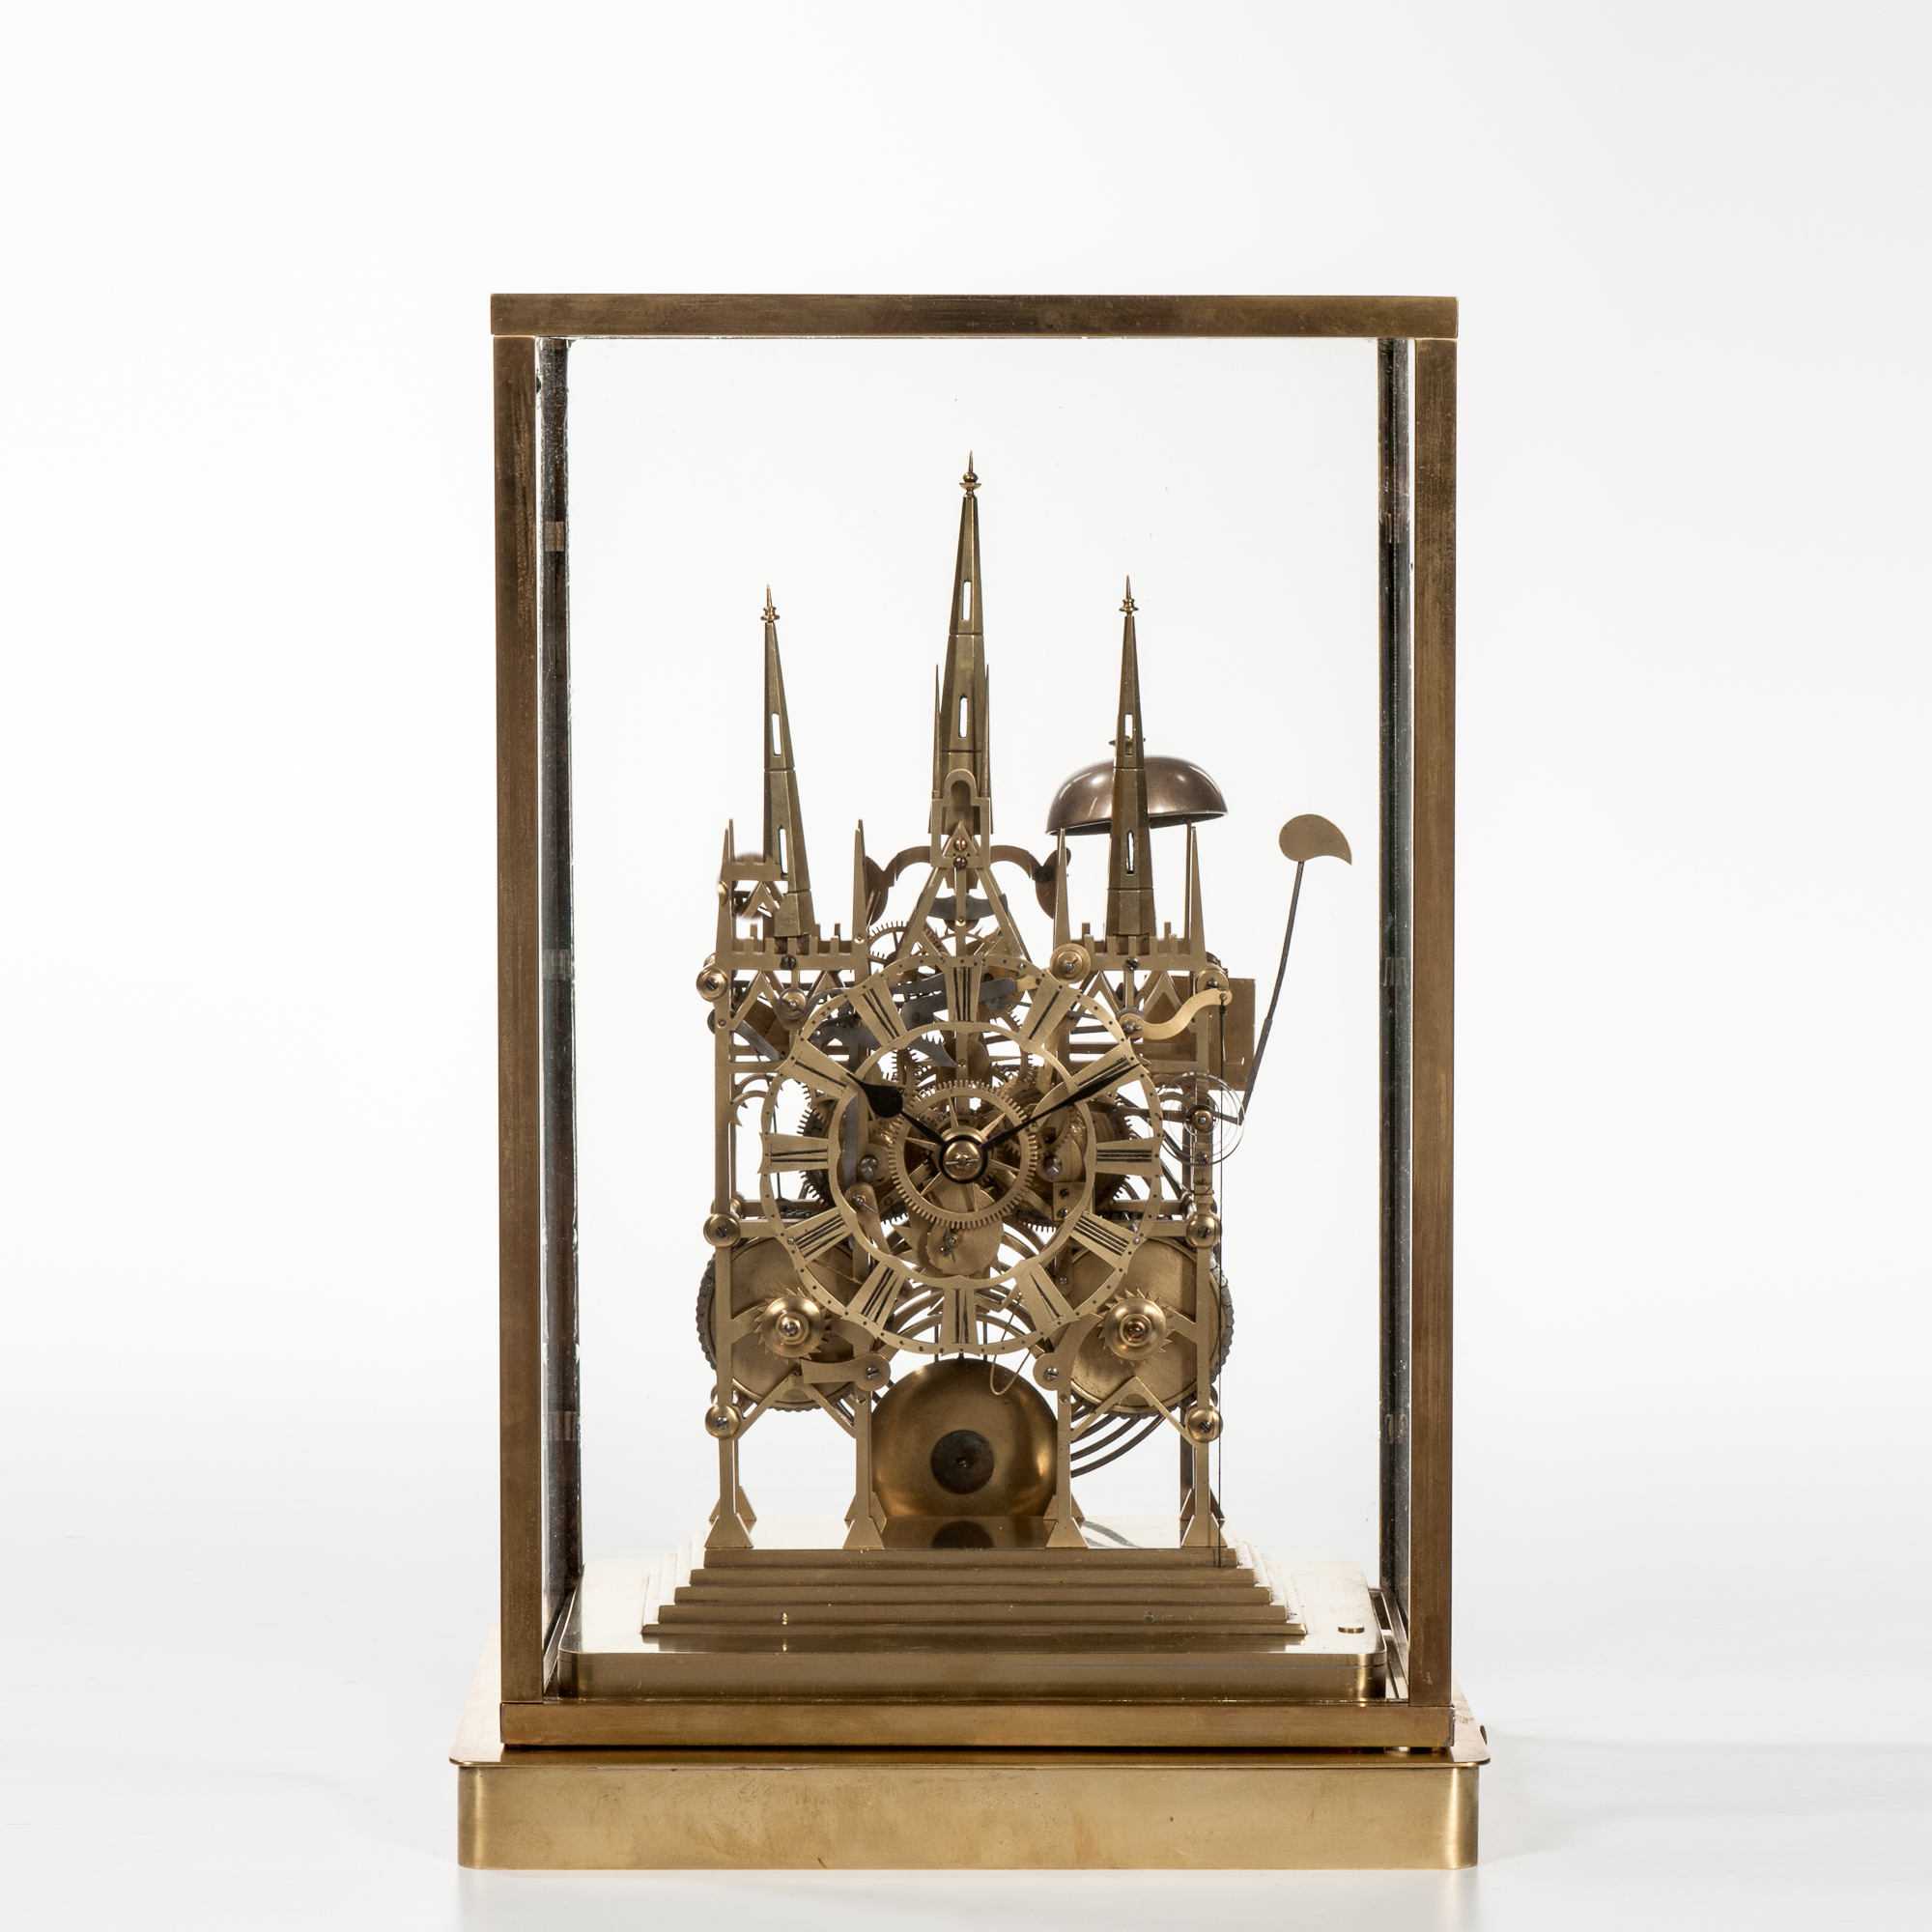 Litchfield Cathedral Striking Skeleton Clock